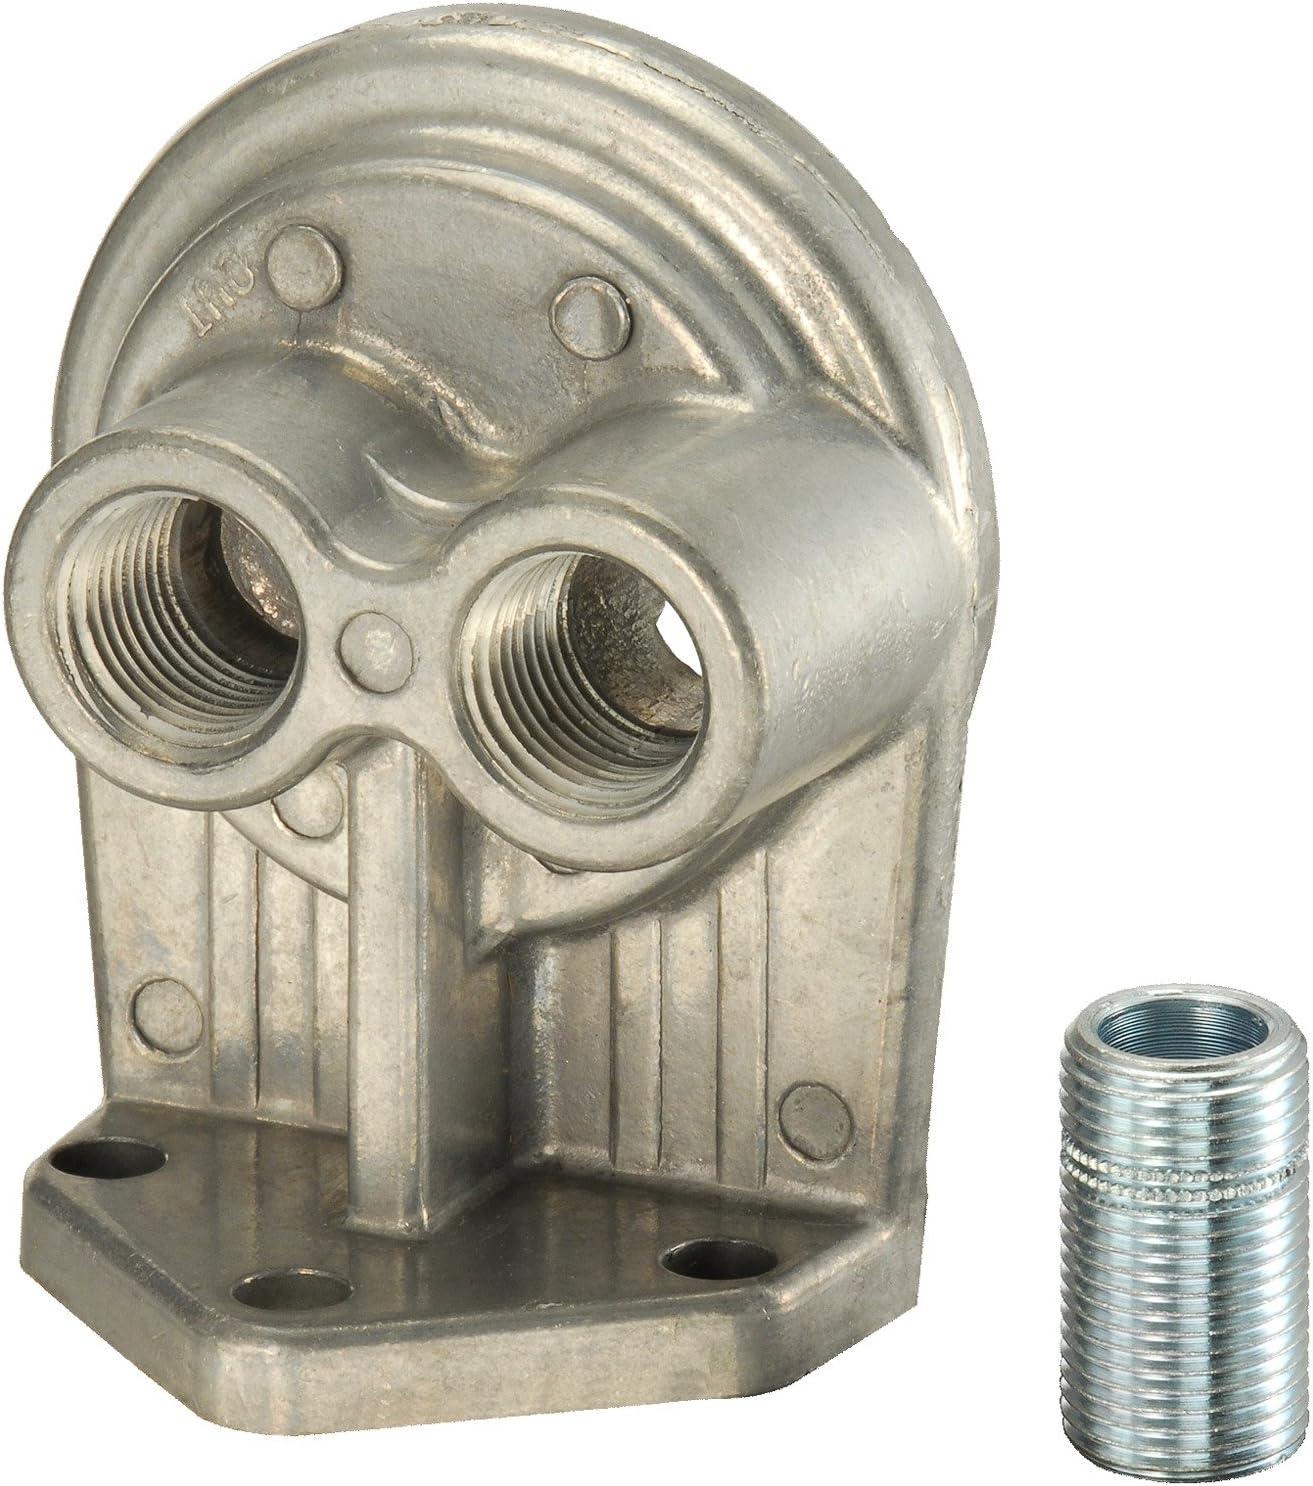 amazon.com: fram hpk2 spin-on filter base: automotive  amazon.com